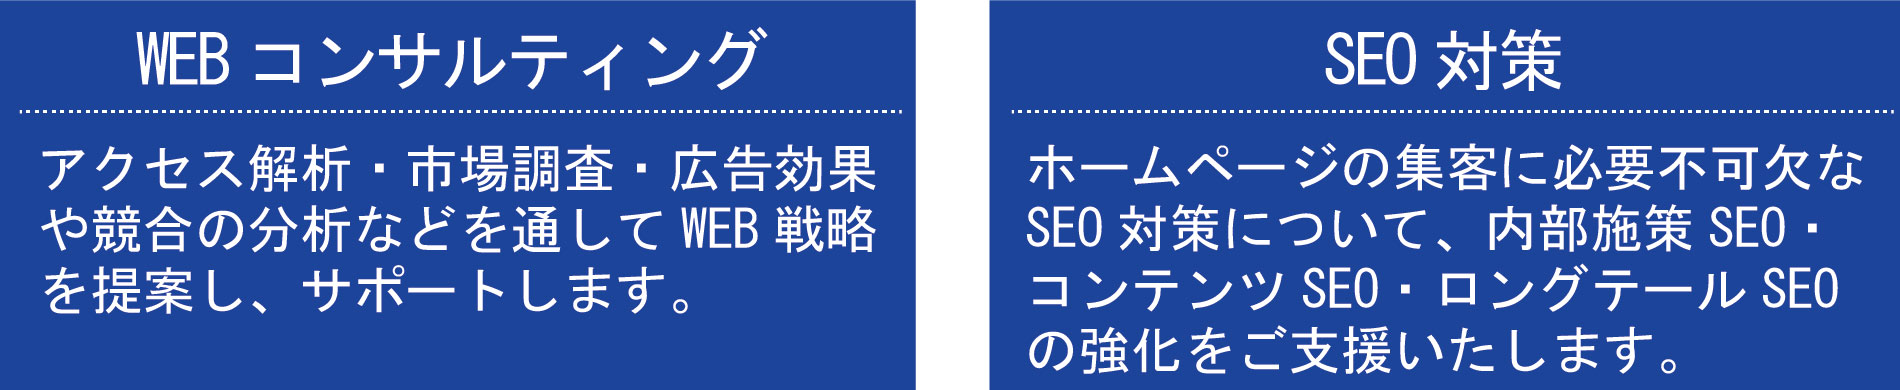 WEBコンサルティング アクセス解析・市場調査・広告効果や競合の分析などを 通してWEB戦略を提案し、サポートします。 SEO対策 ホームページの集客に必要不可欠なSEO対策について、 内部施策SEO・コンテンツSEO・ロングテールSEOの強化 をご支援いたします。